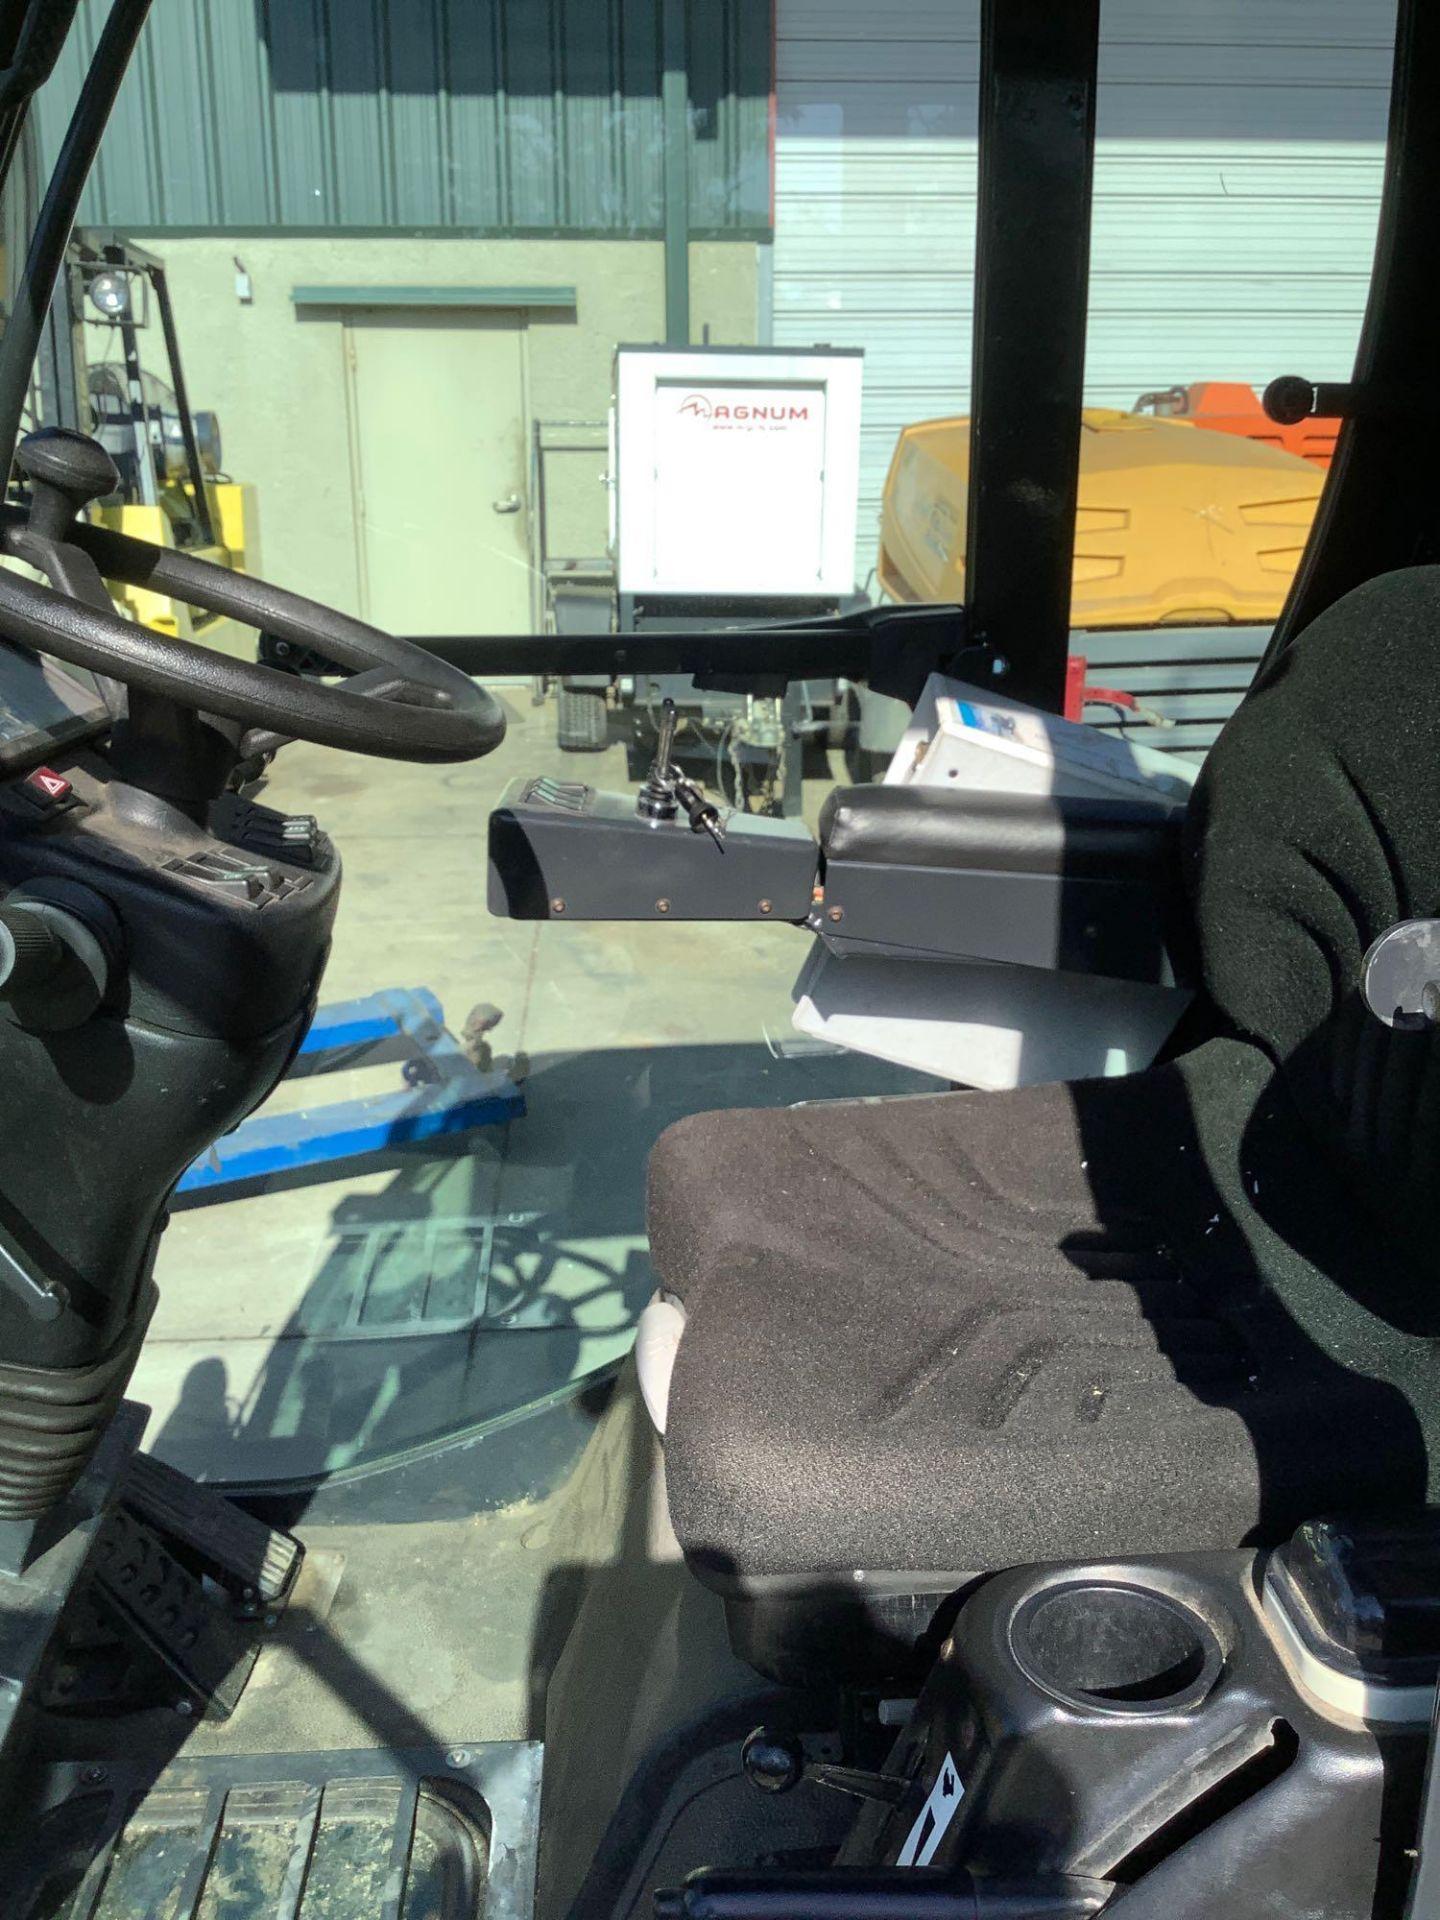 MADVAC COMPACT SWEEPER MODEL LS100 ,ENCLOSED CAB,BACK UP CAMERA, A/C AIR, EXTRA KEY - Image 11 of 15